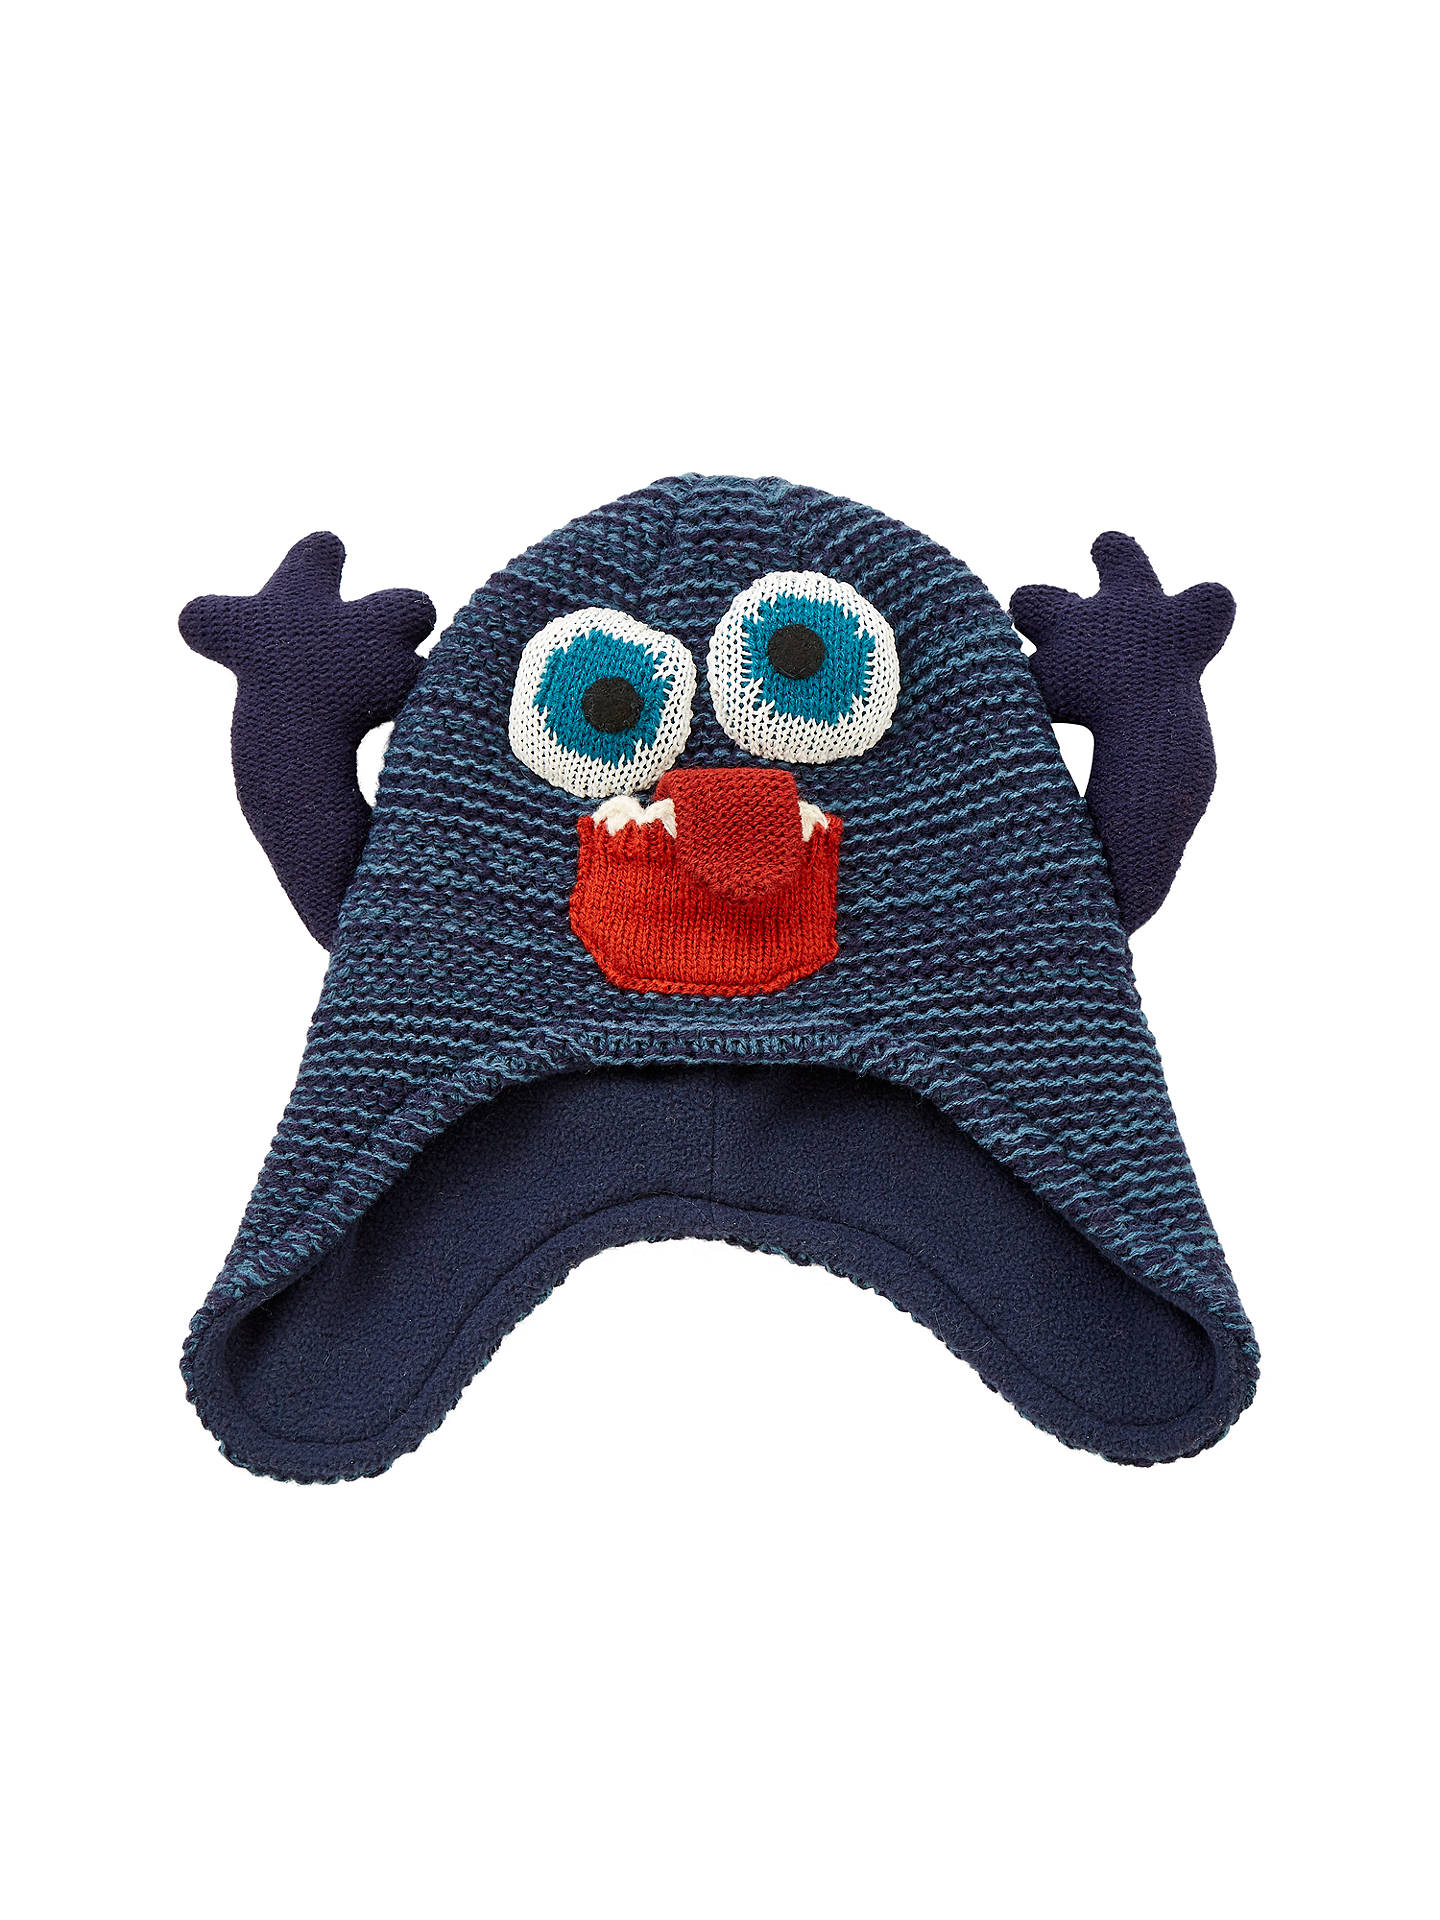 John Lewis Childrens Monster Trapper Hat Blue At John Lewis Partners